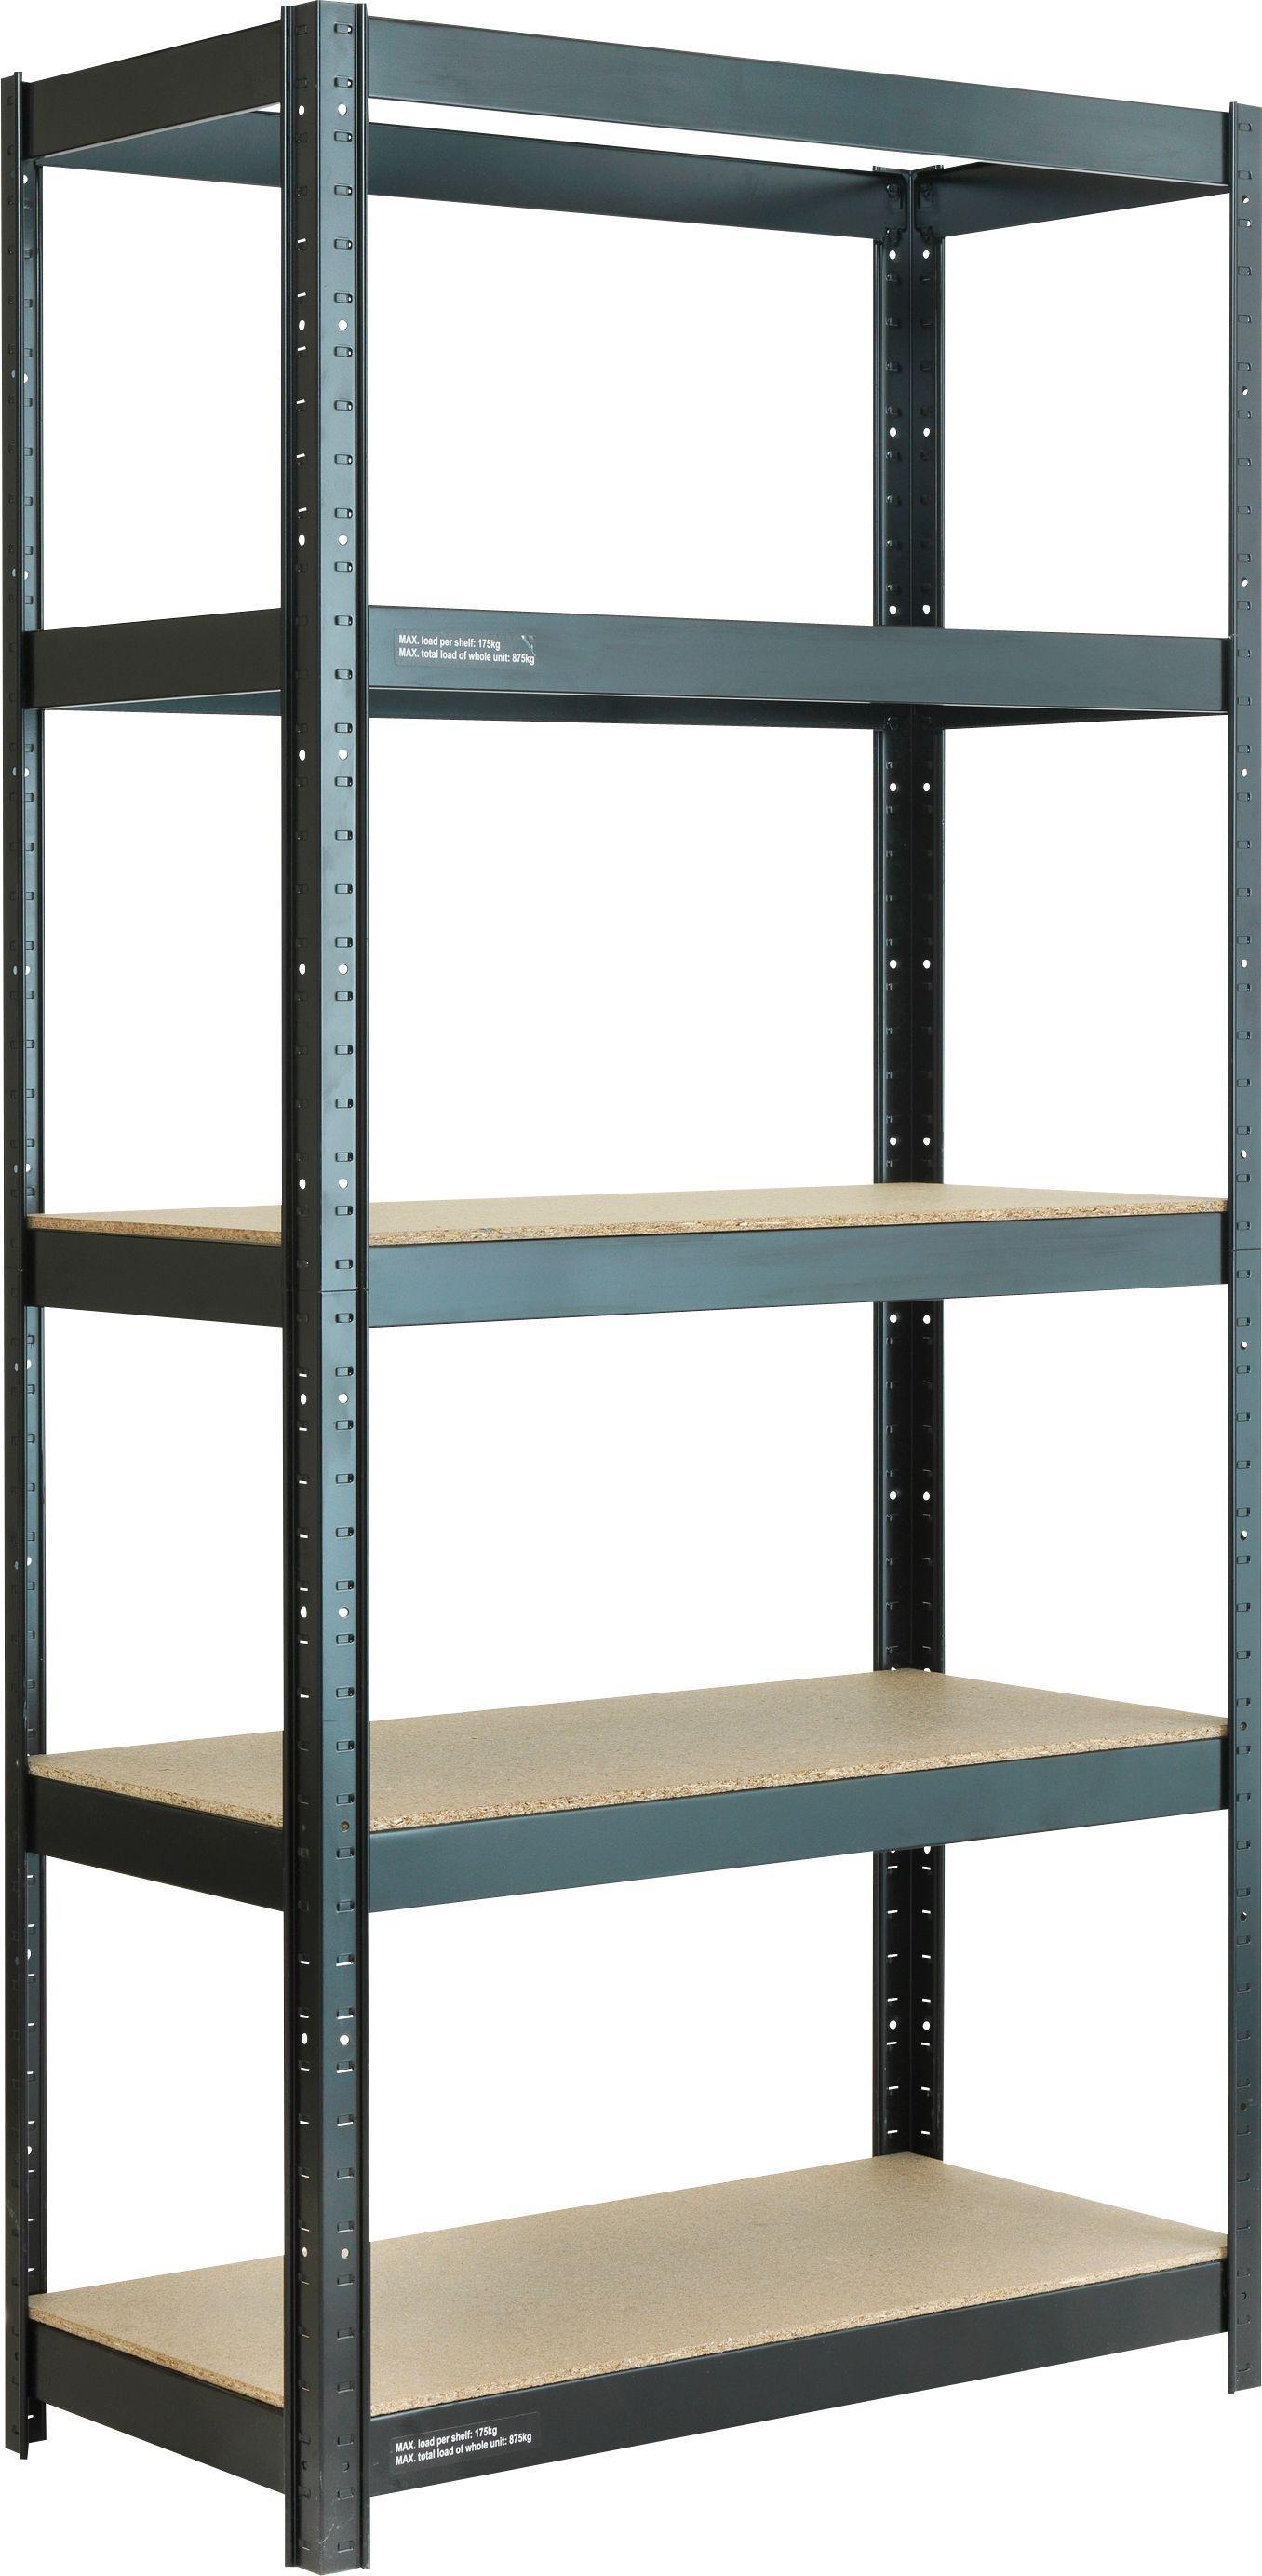 sale on 5 tier heavy duty shelving unit argos now. Black Bedroom Furniture Sets. Home Design Ideas